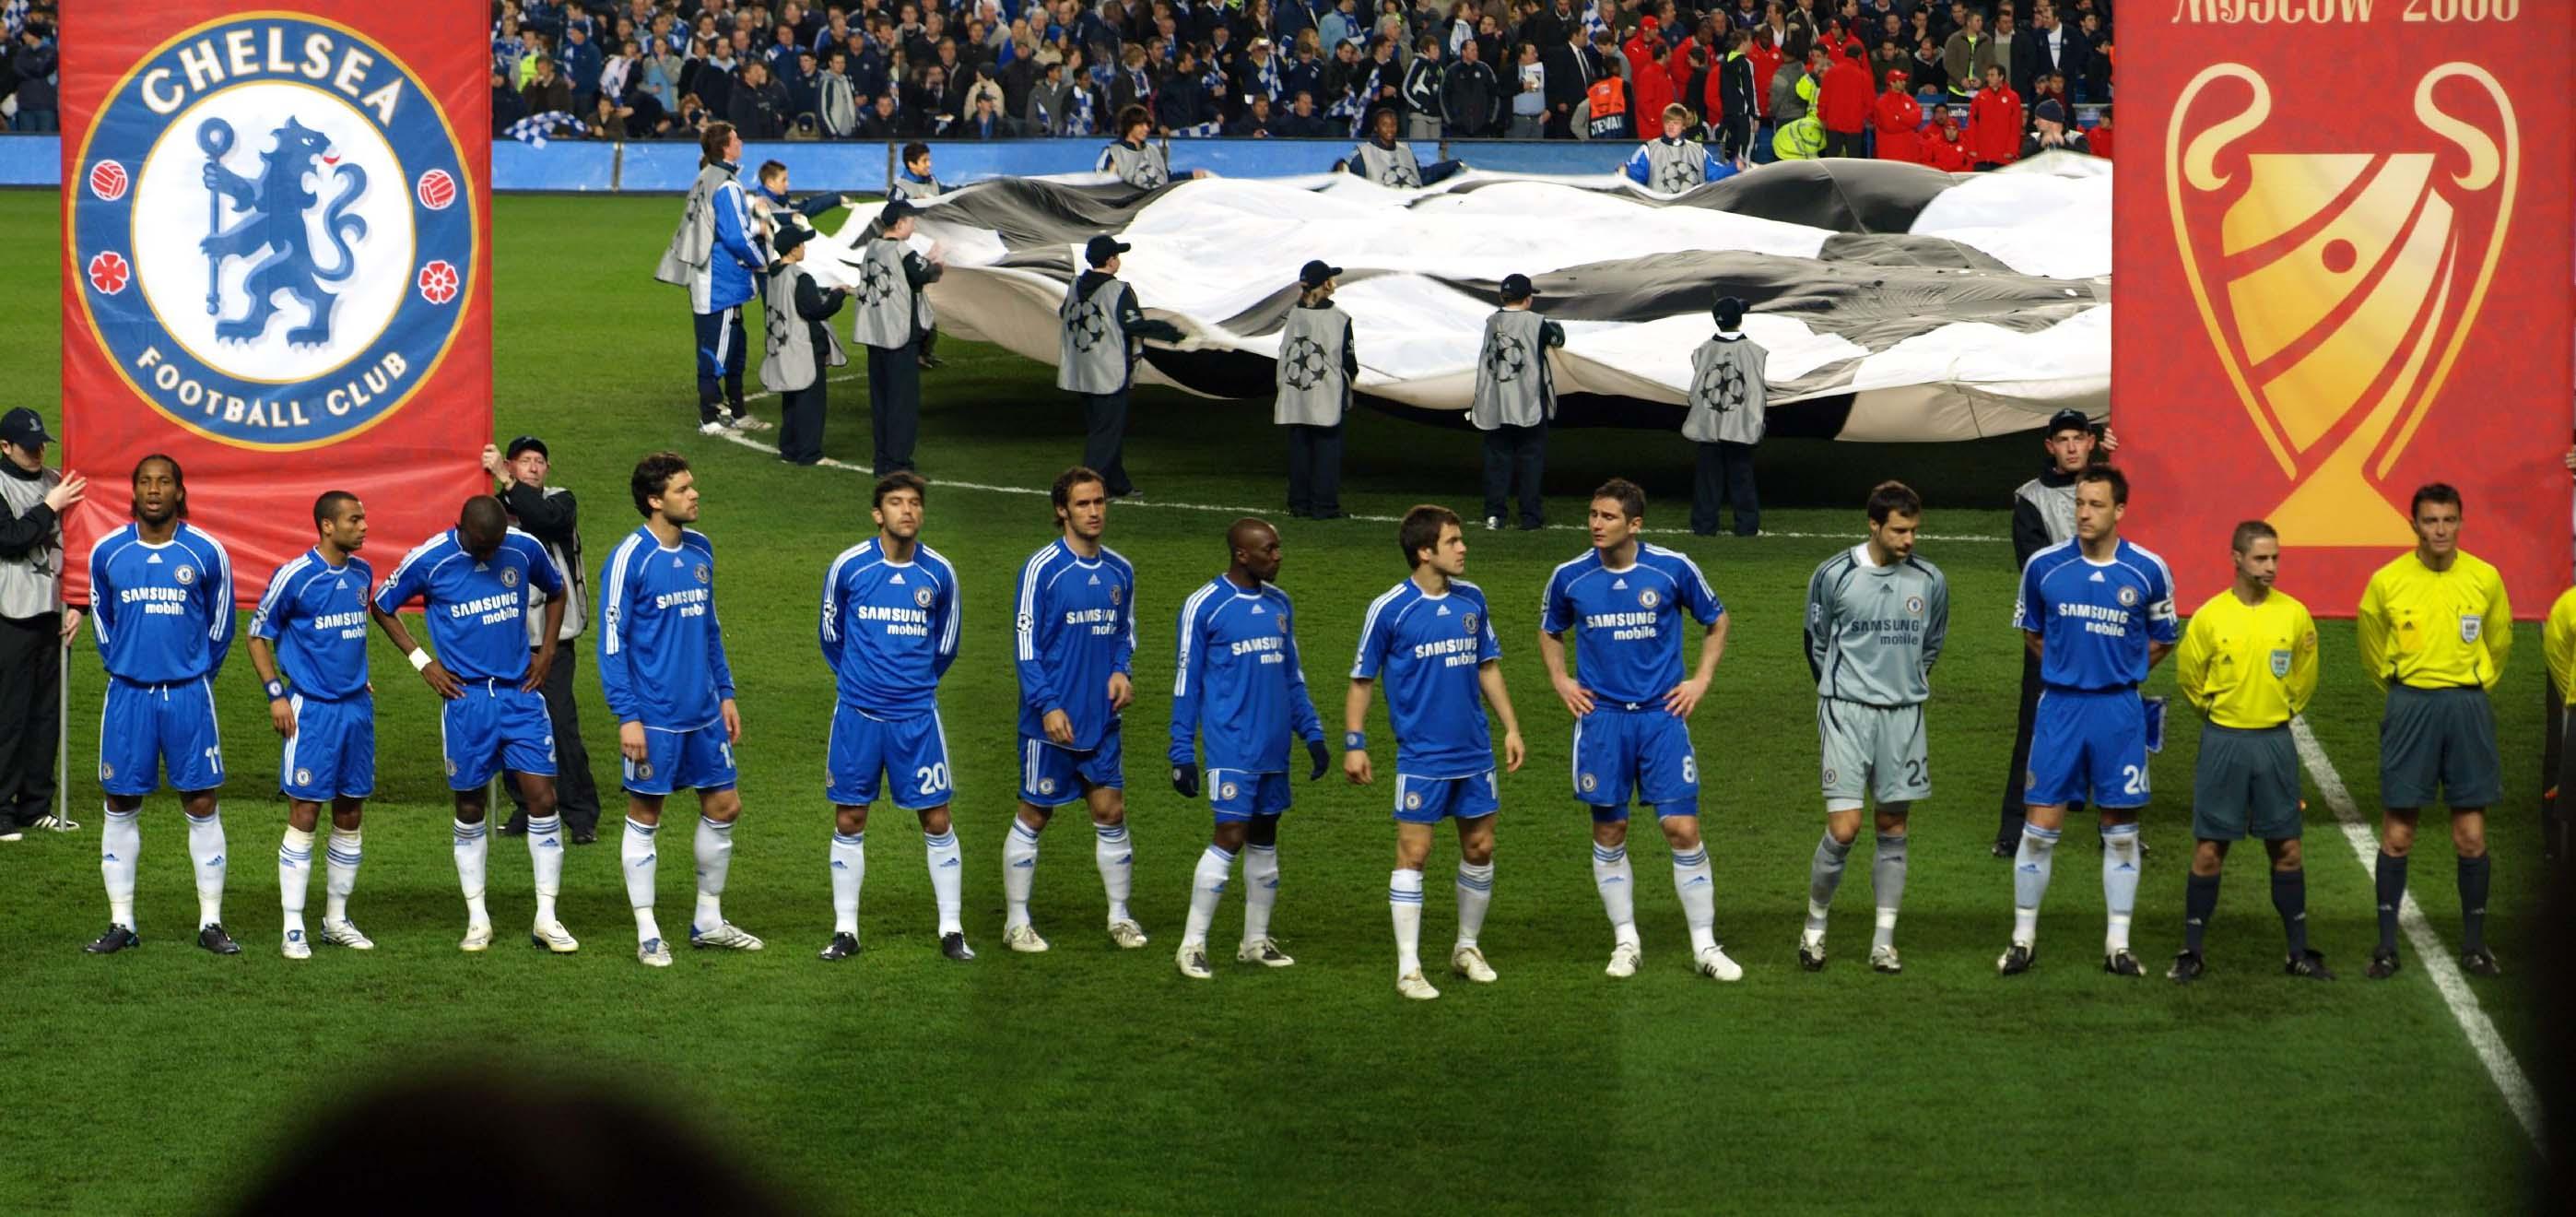 b80565a411 Chelsea Football Club - Wikiwand